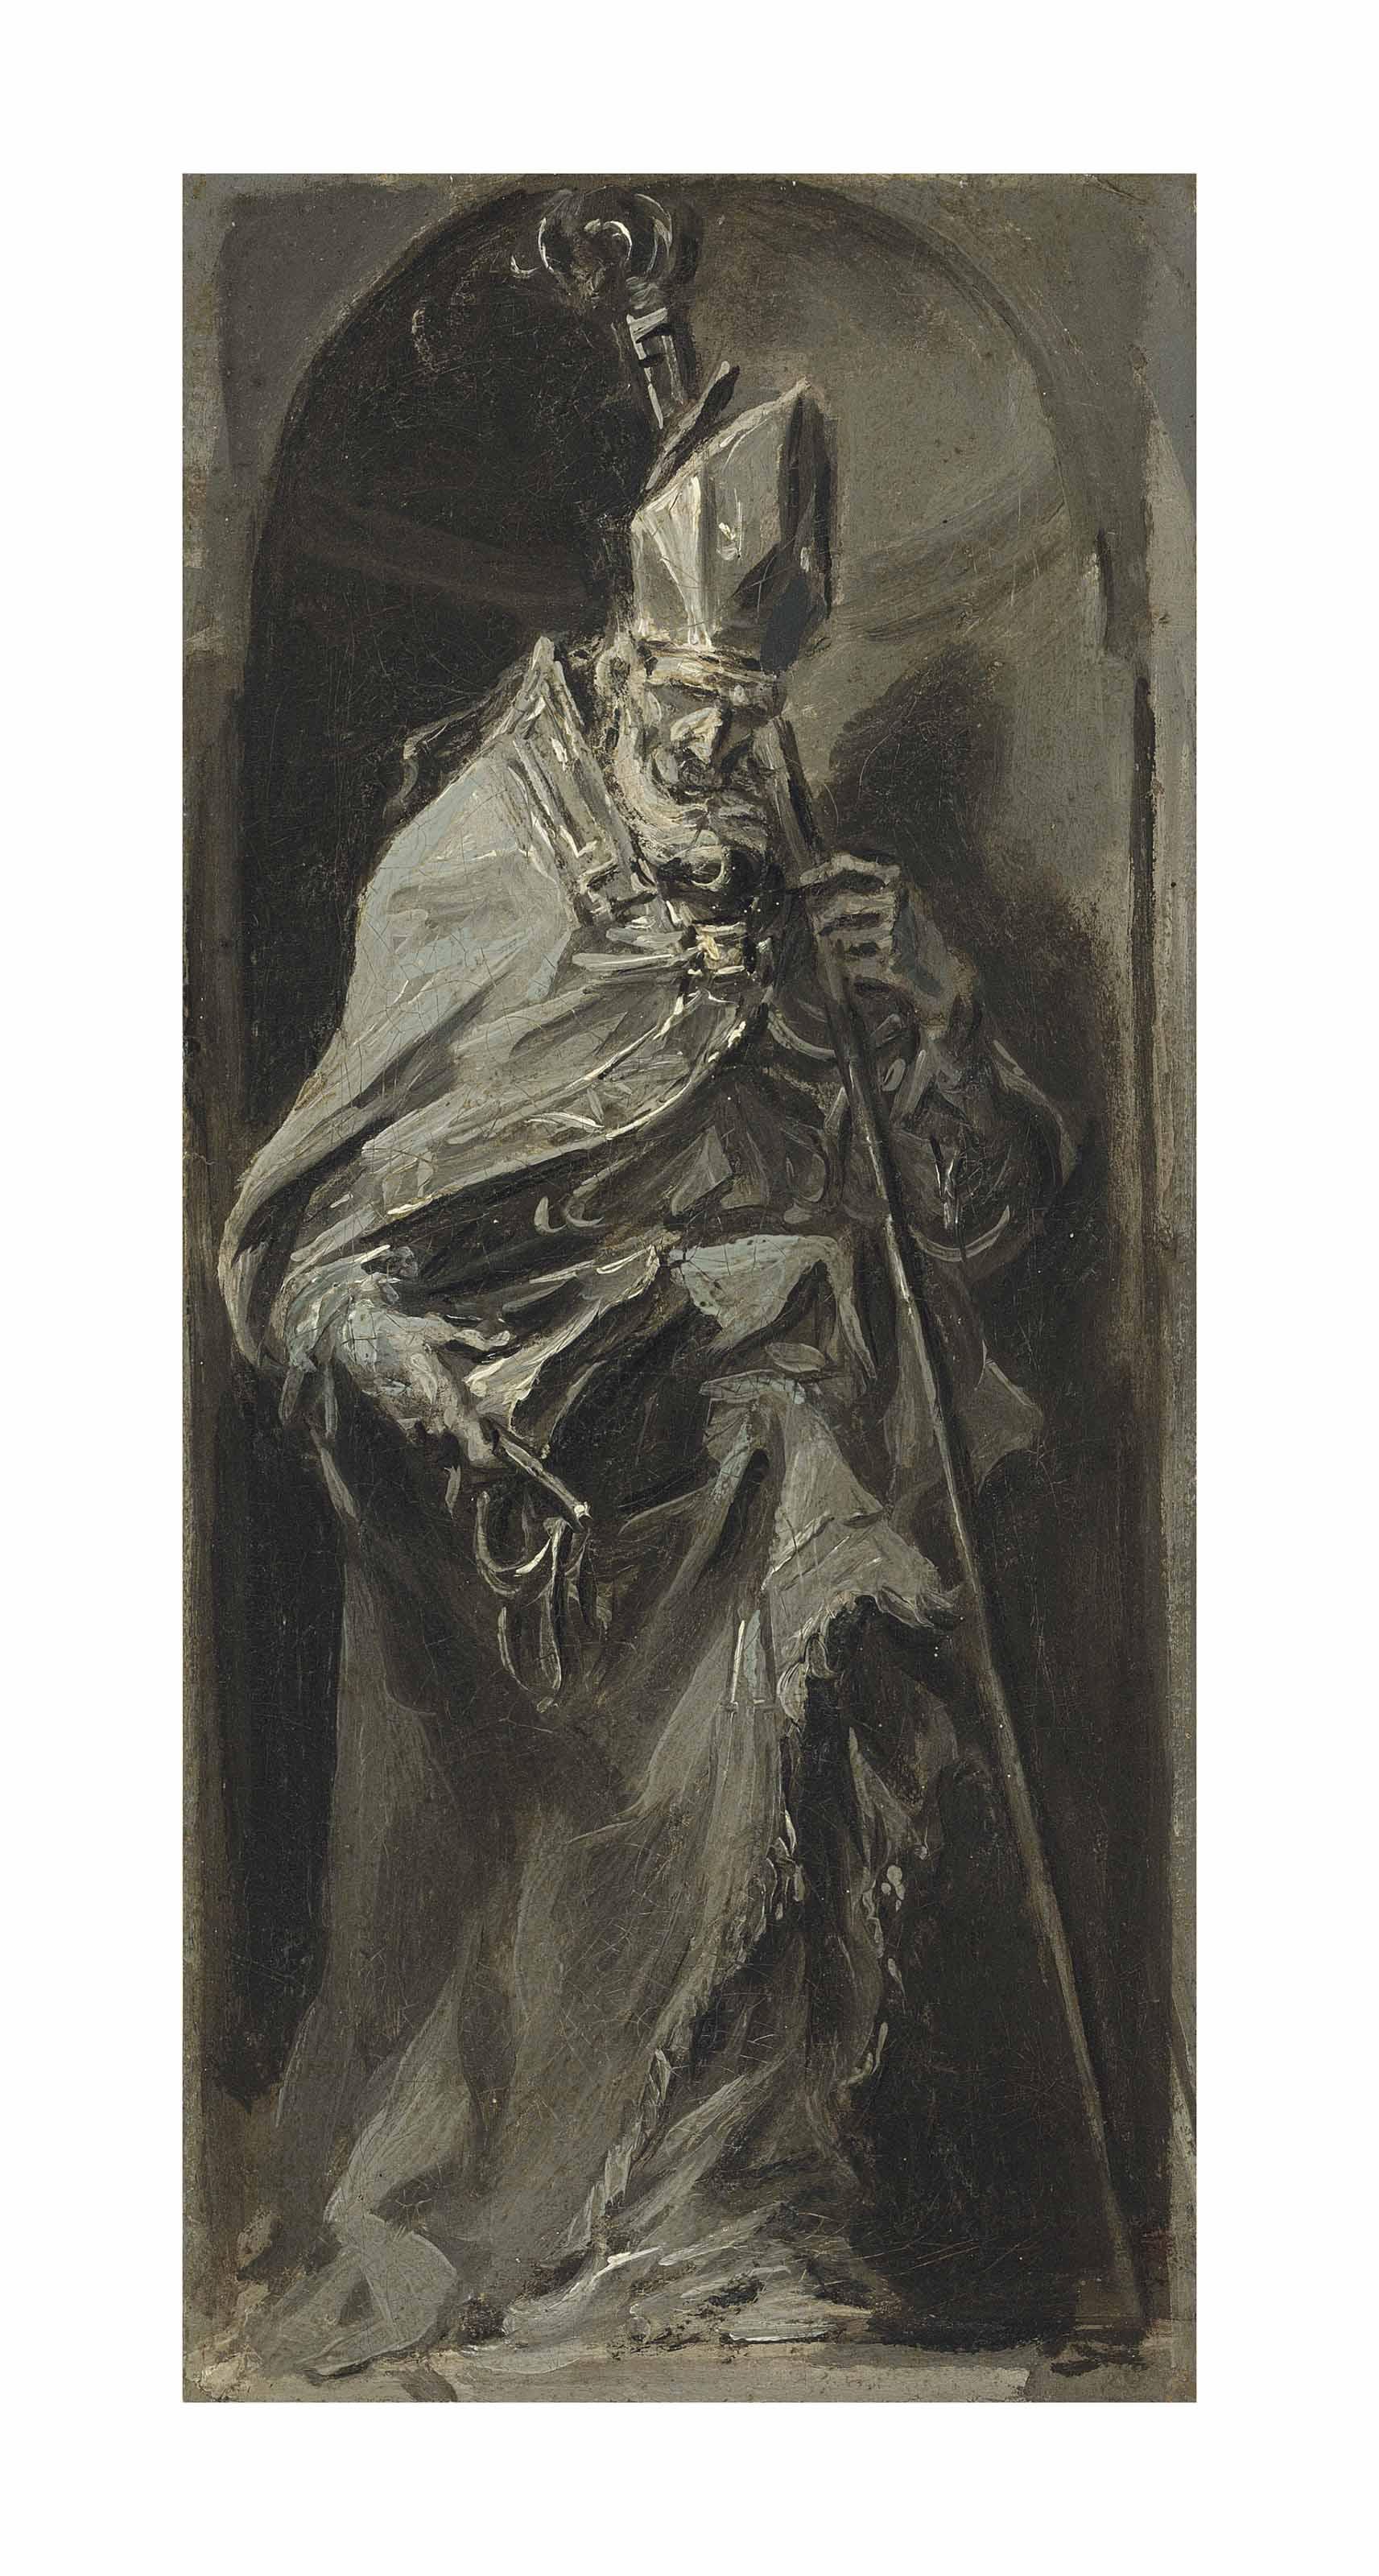 Saint Ambrose standing in a niche - en grisaille, a bozzetto